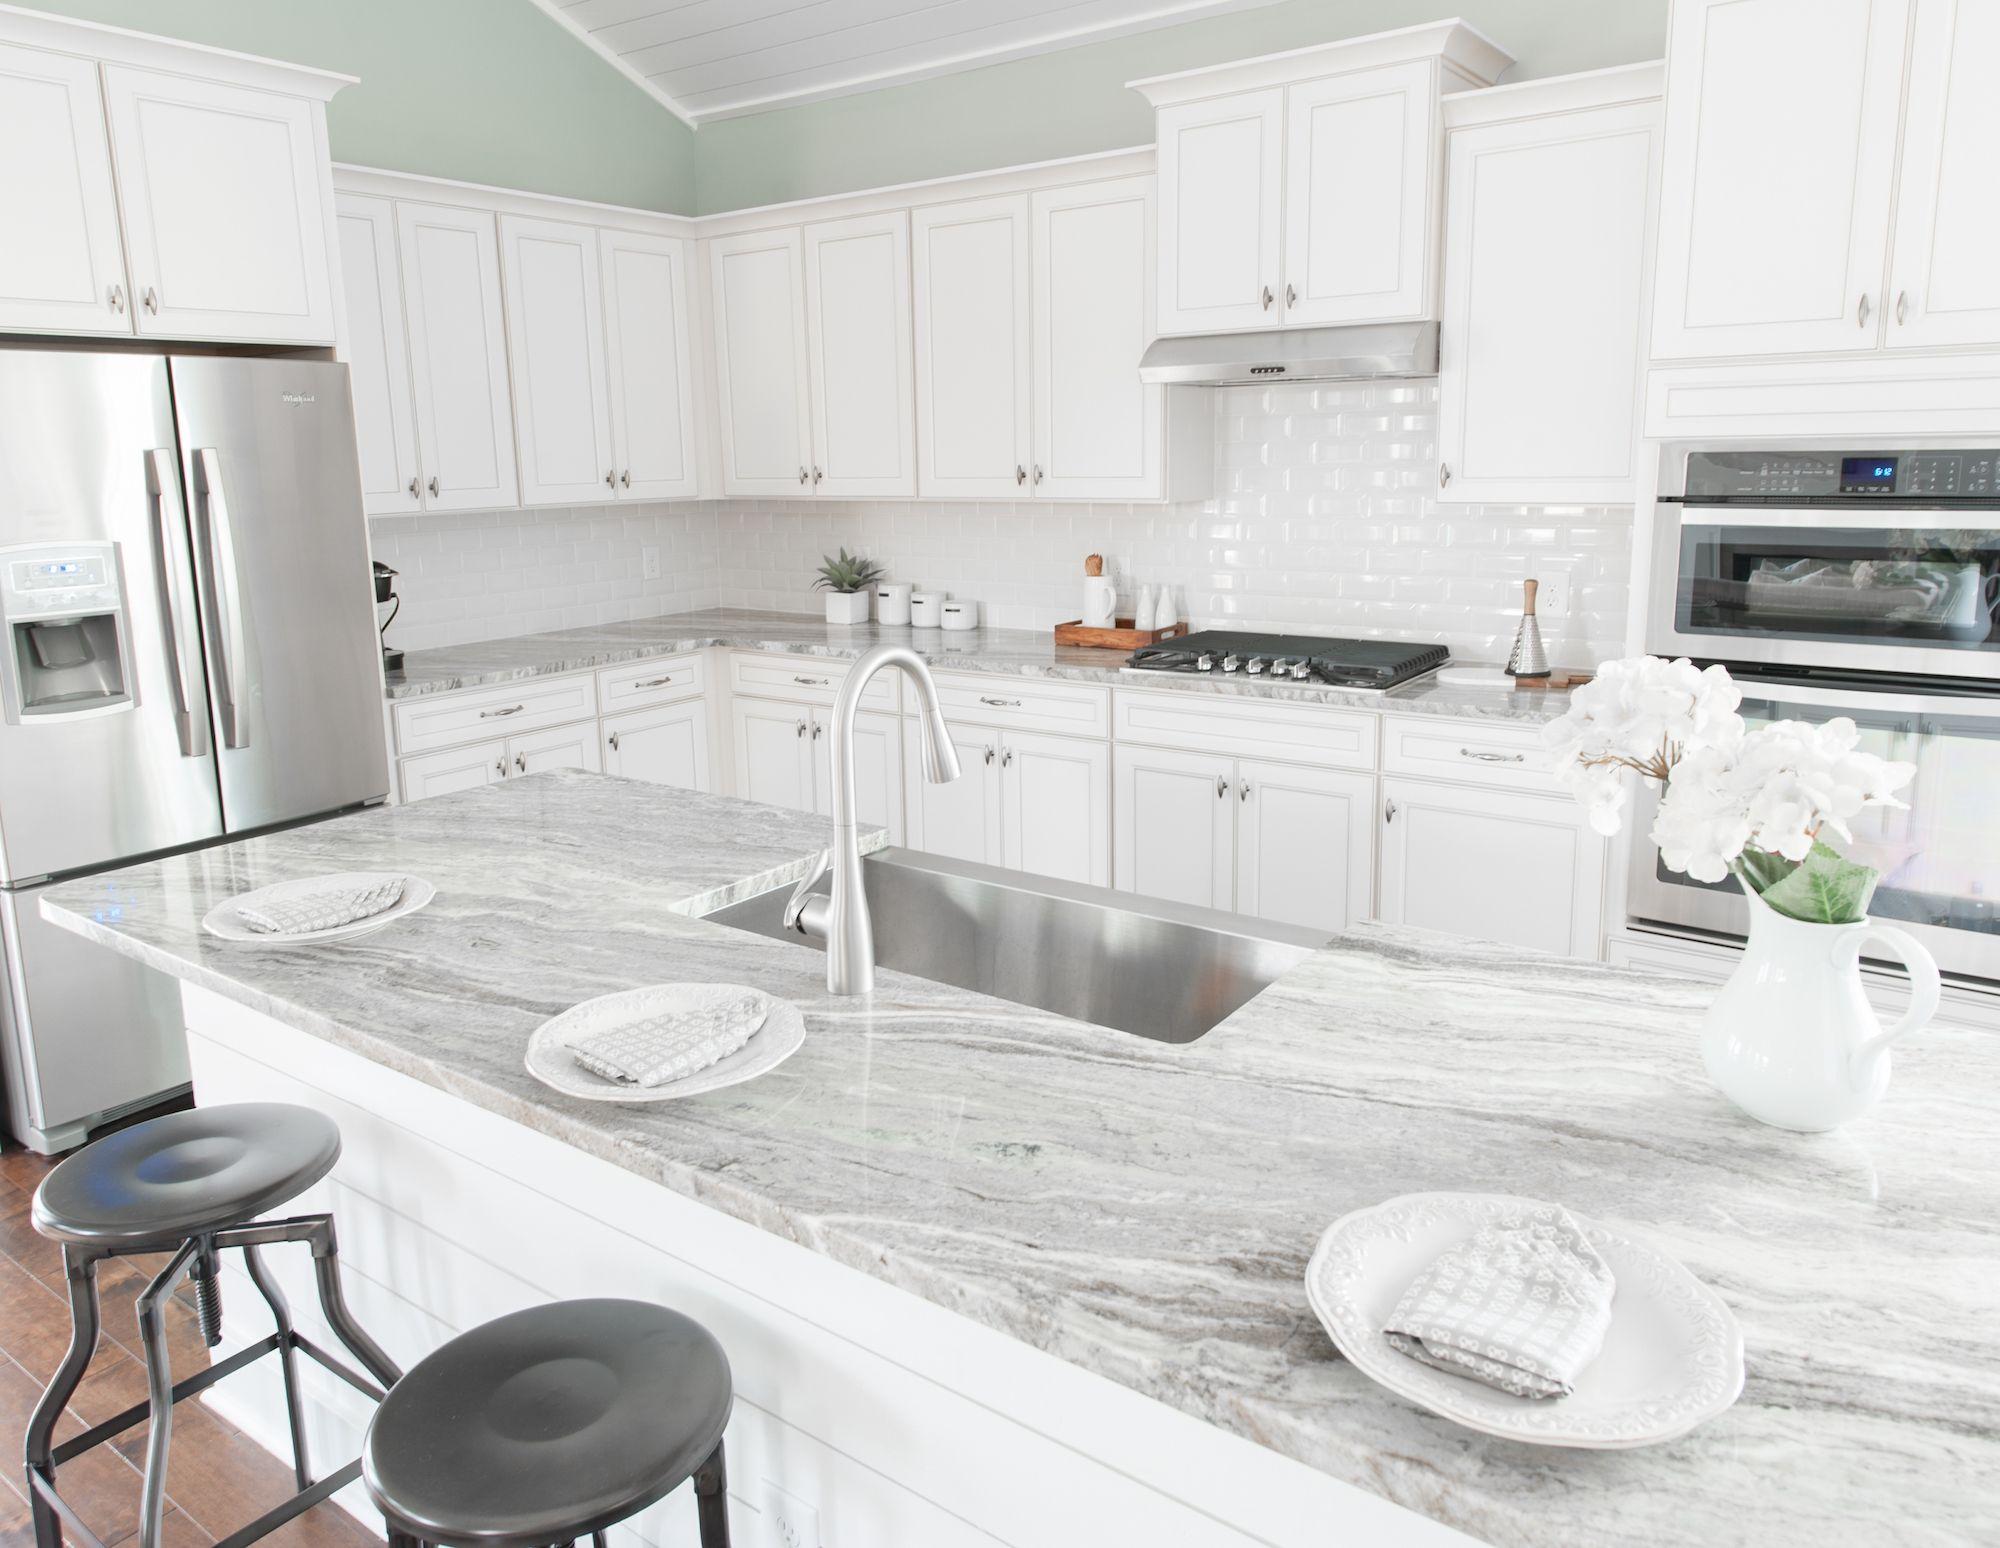 Designing Your Custom Kitchen | Crescent Homes Blog